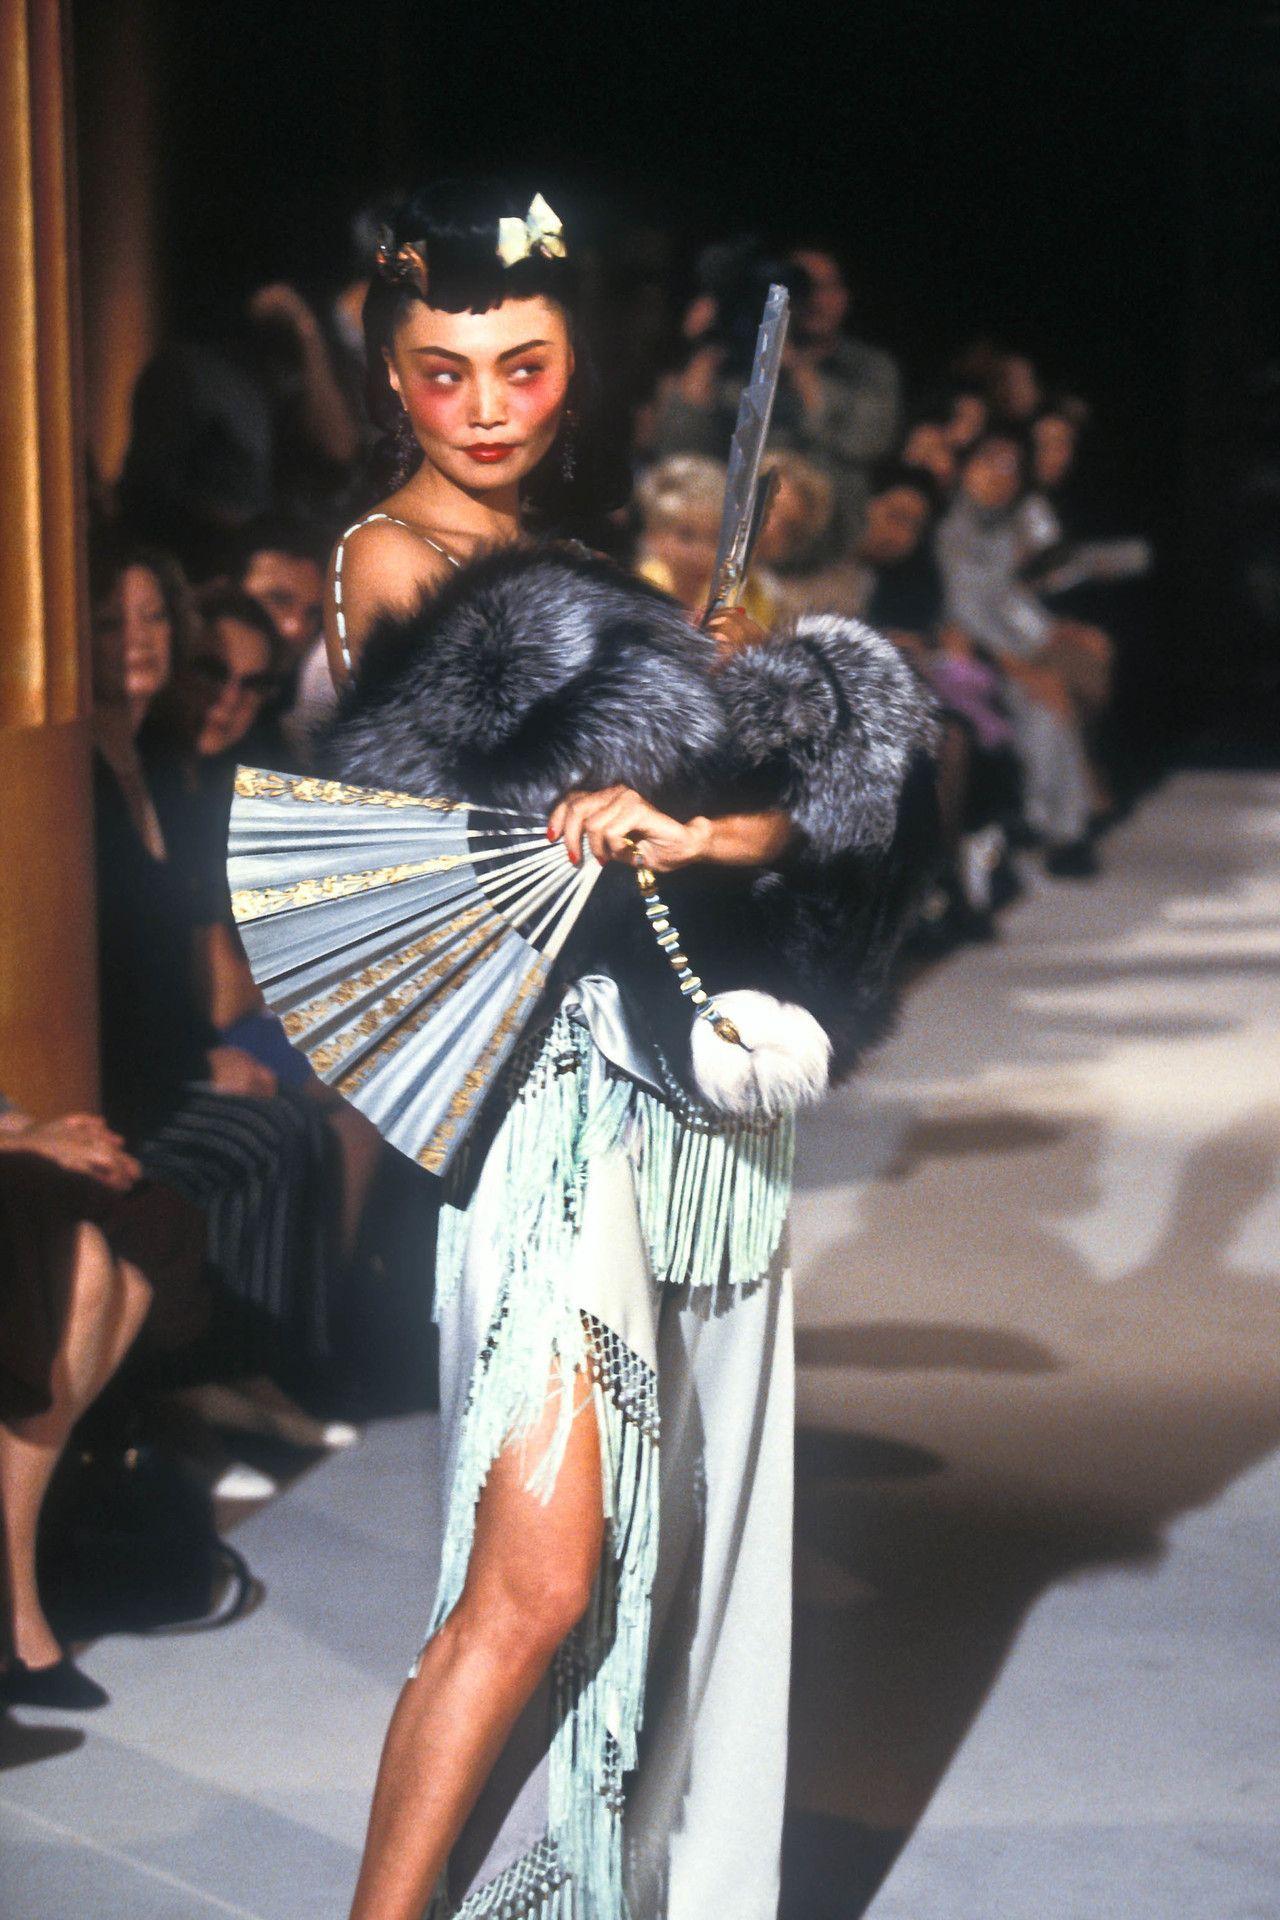 Rosa Turich,Rebecca Romijn USA 2 1997-1998 Adult video Joan Bennett,Lesley Manville